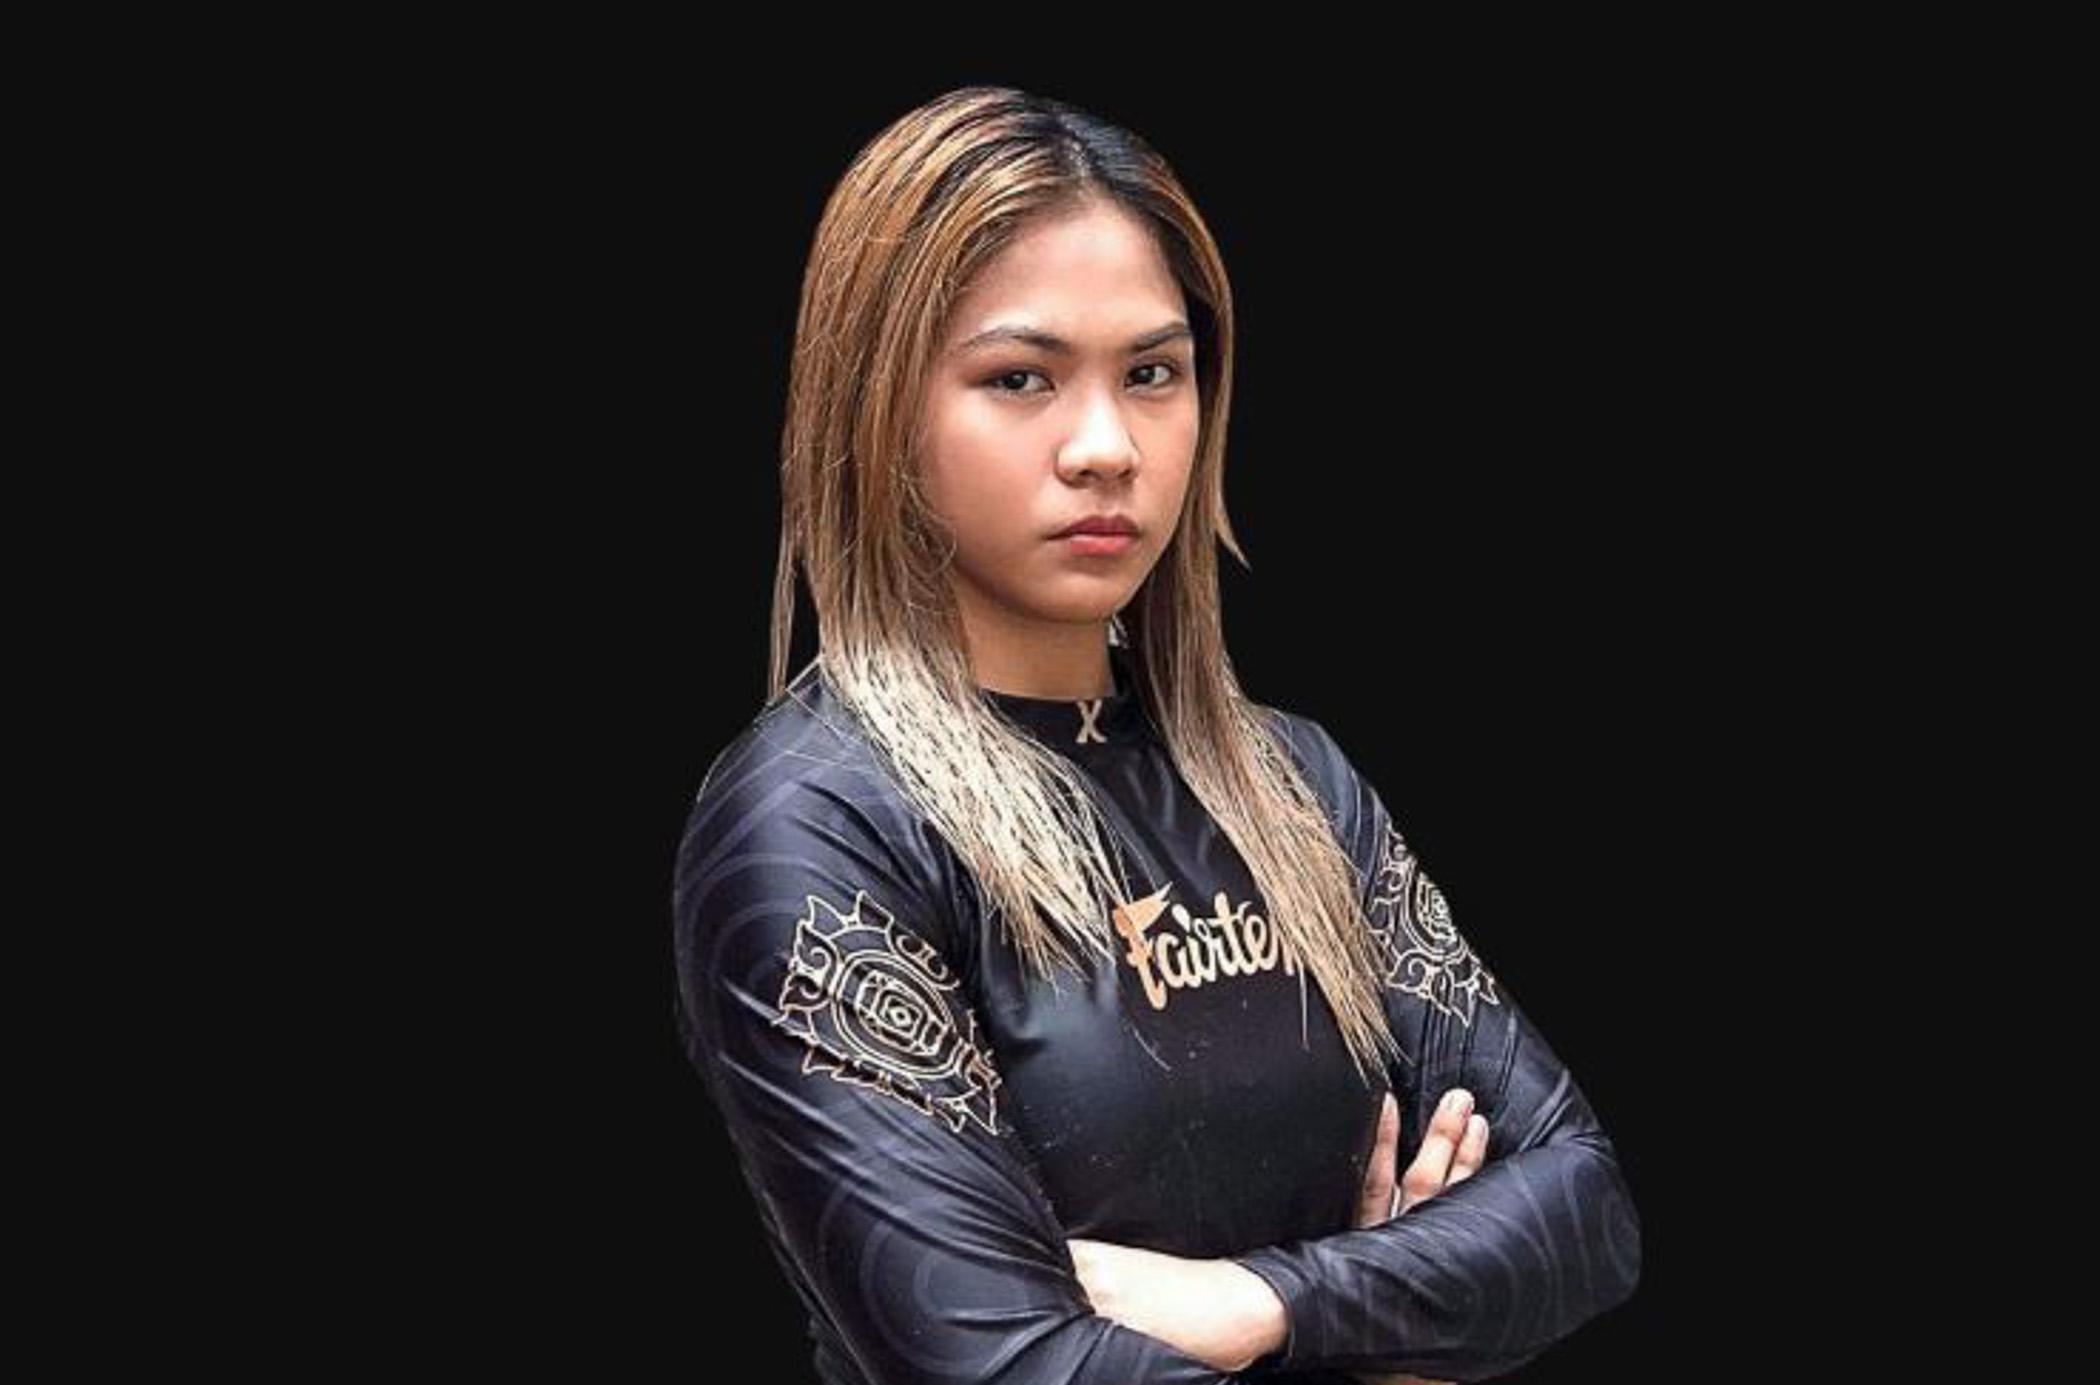 Denice Zamboanga targets title fight with Angela Lee